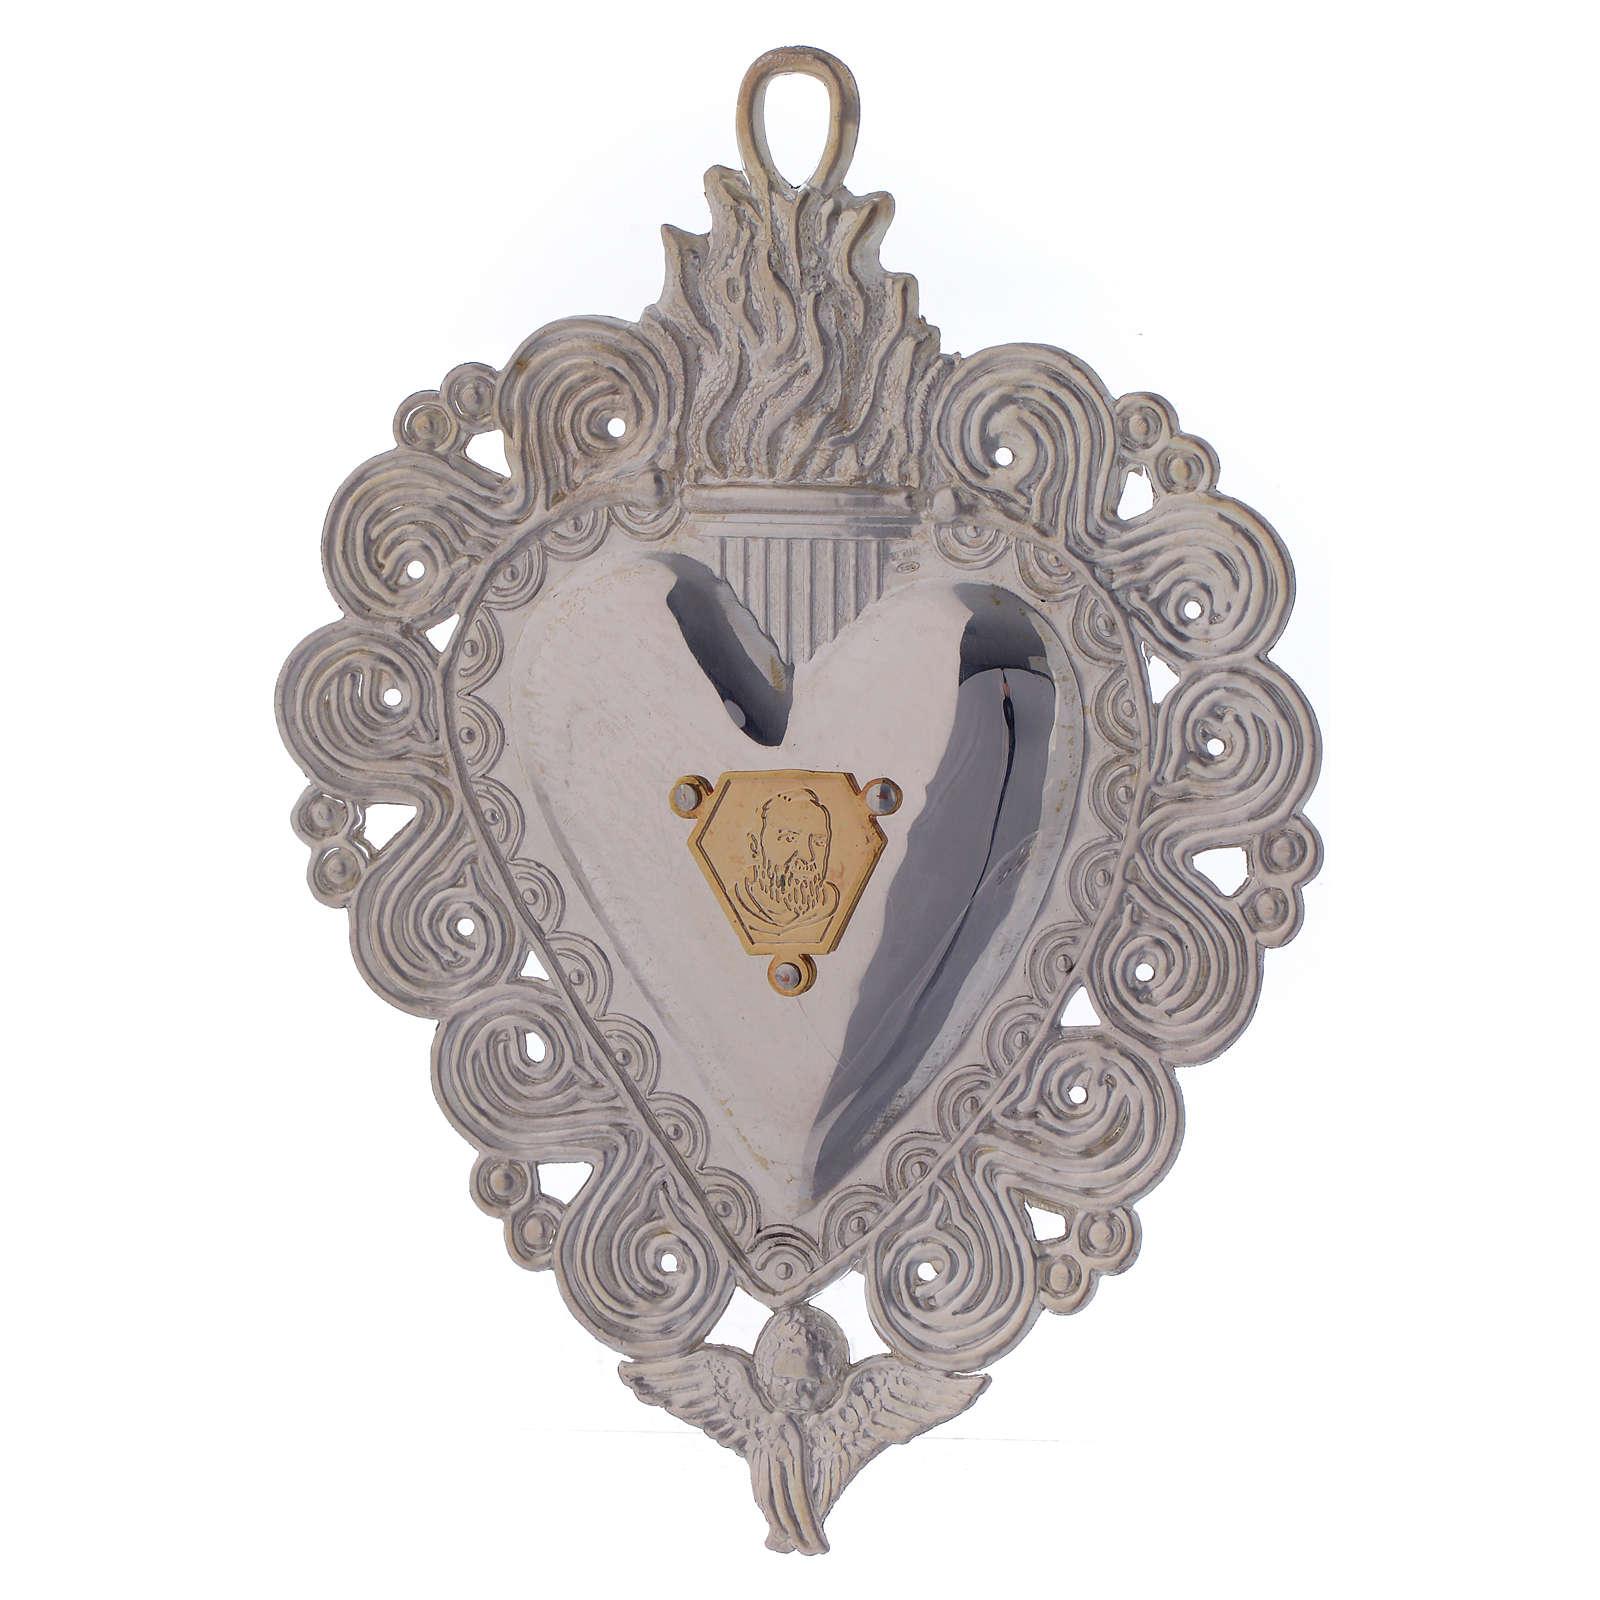 Corazón votivo Pío de Pietrelcina 9,5 x 7,5 cm. 3